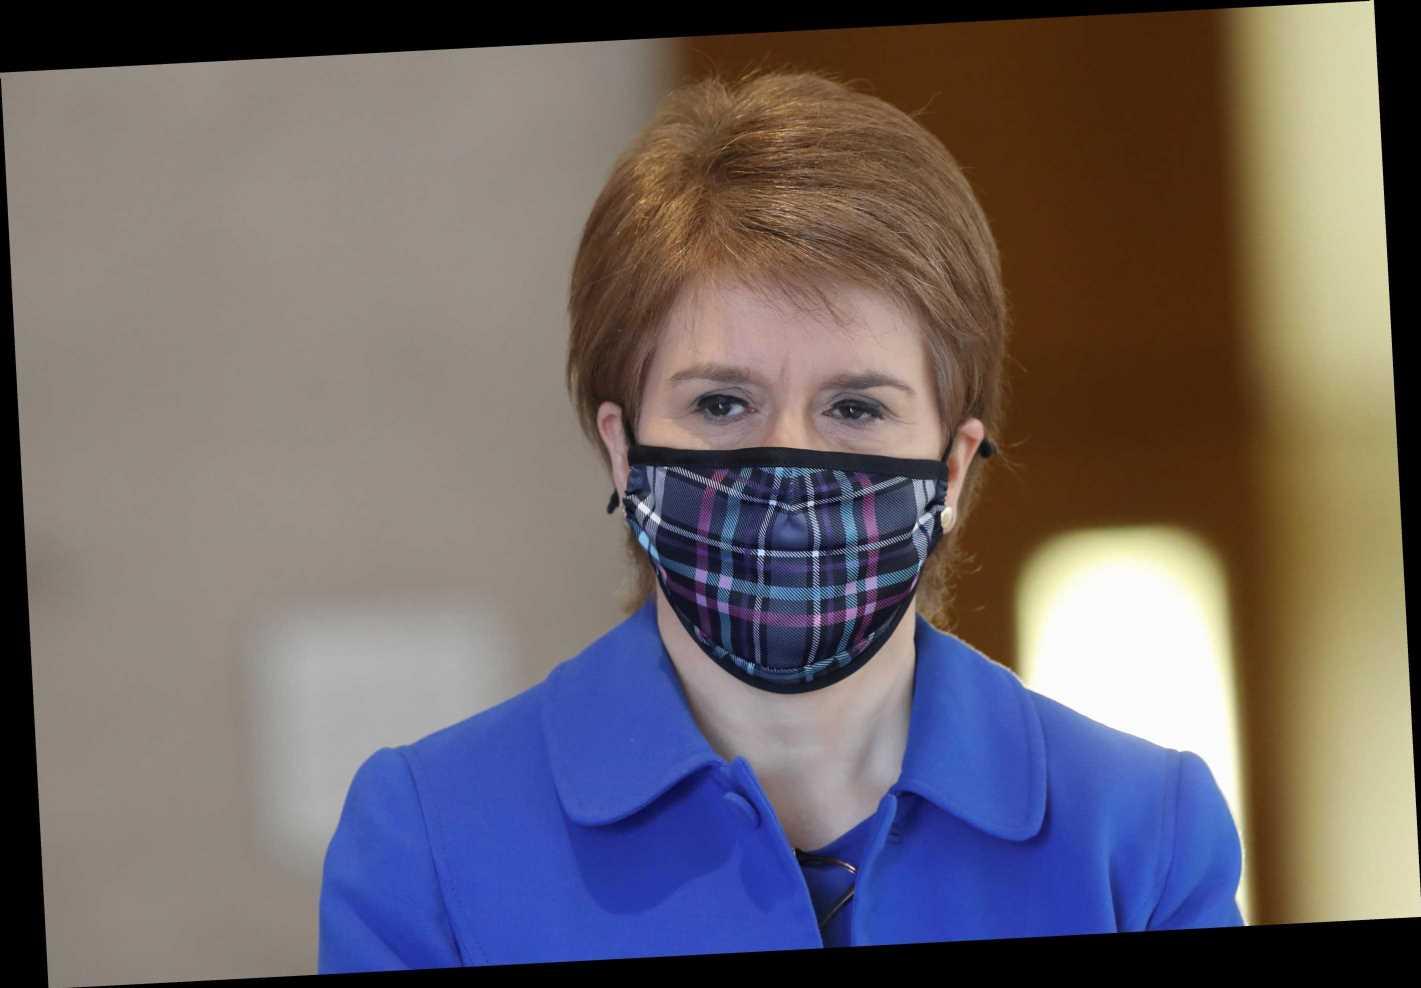 Scotland gets hair cuts, travel & big weddings BEFORE England as Sturgeon brings forward road map piling pressure on PM